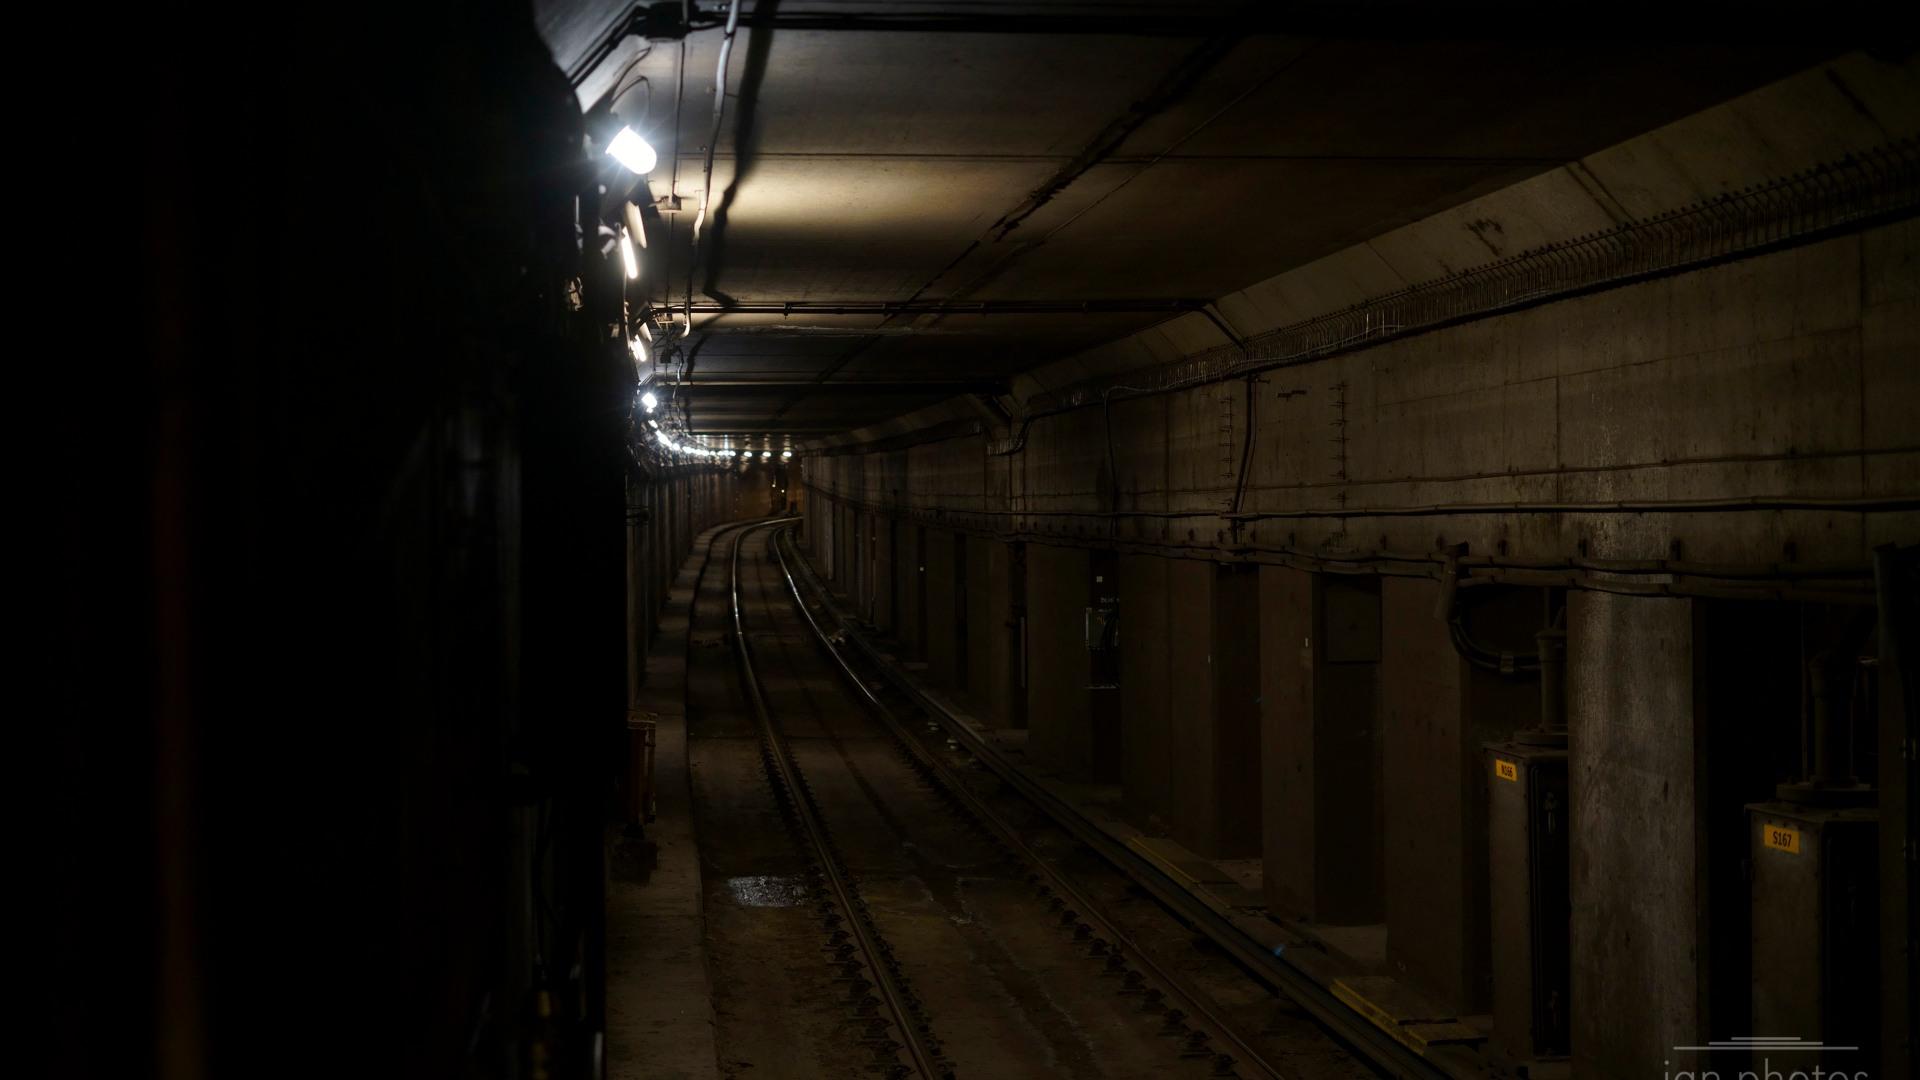 Subway Tunnel TTC | ian.photos